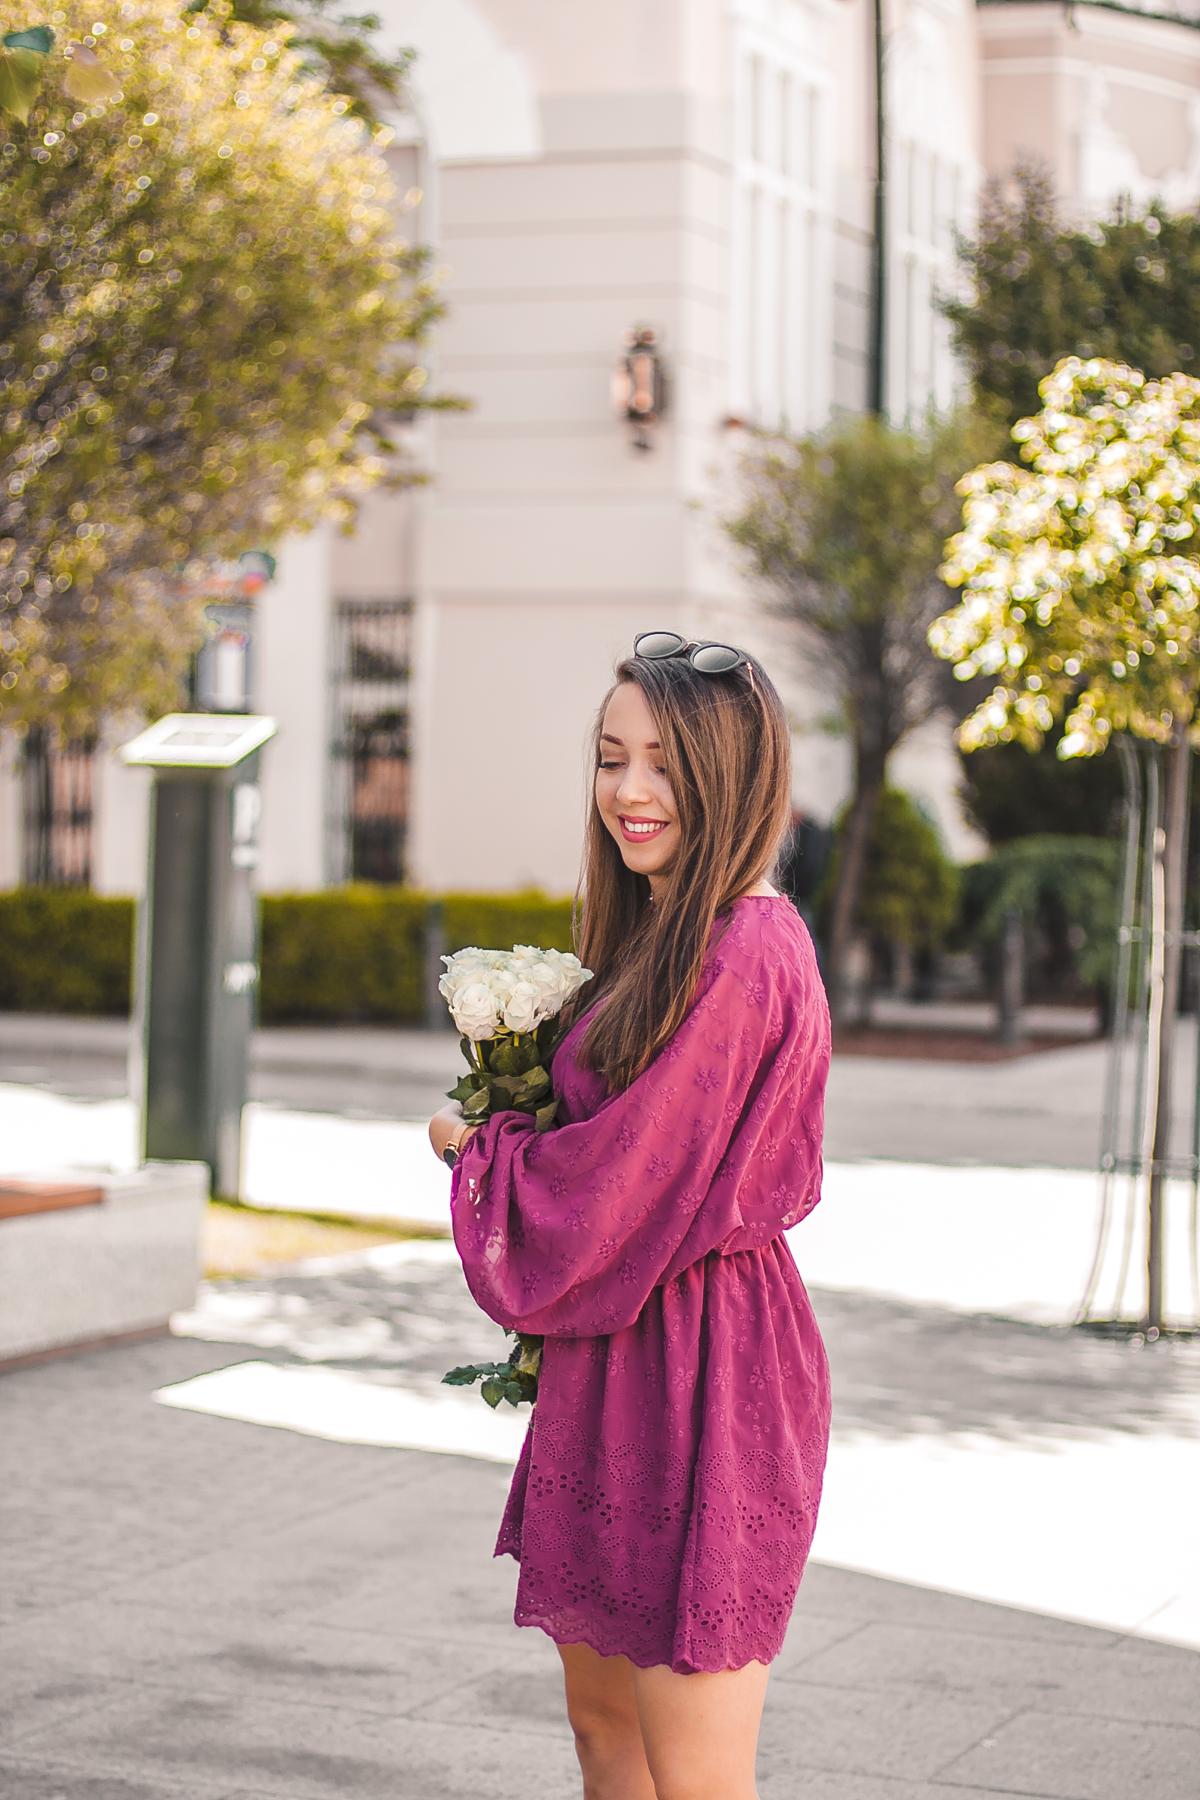 fioletowa sukienka koronkowa na-kd wesele